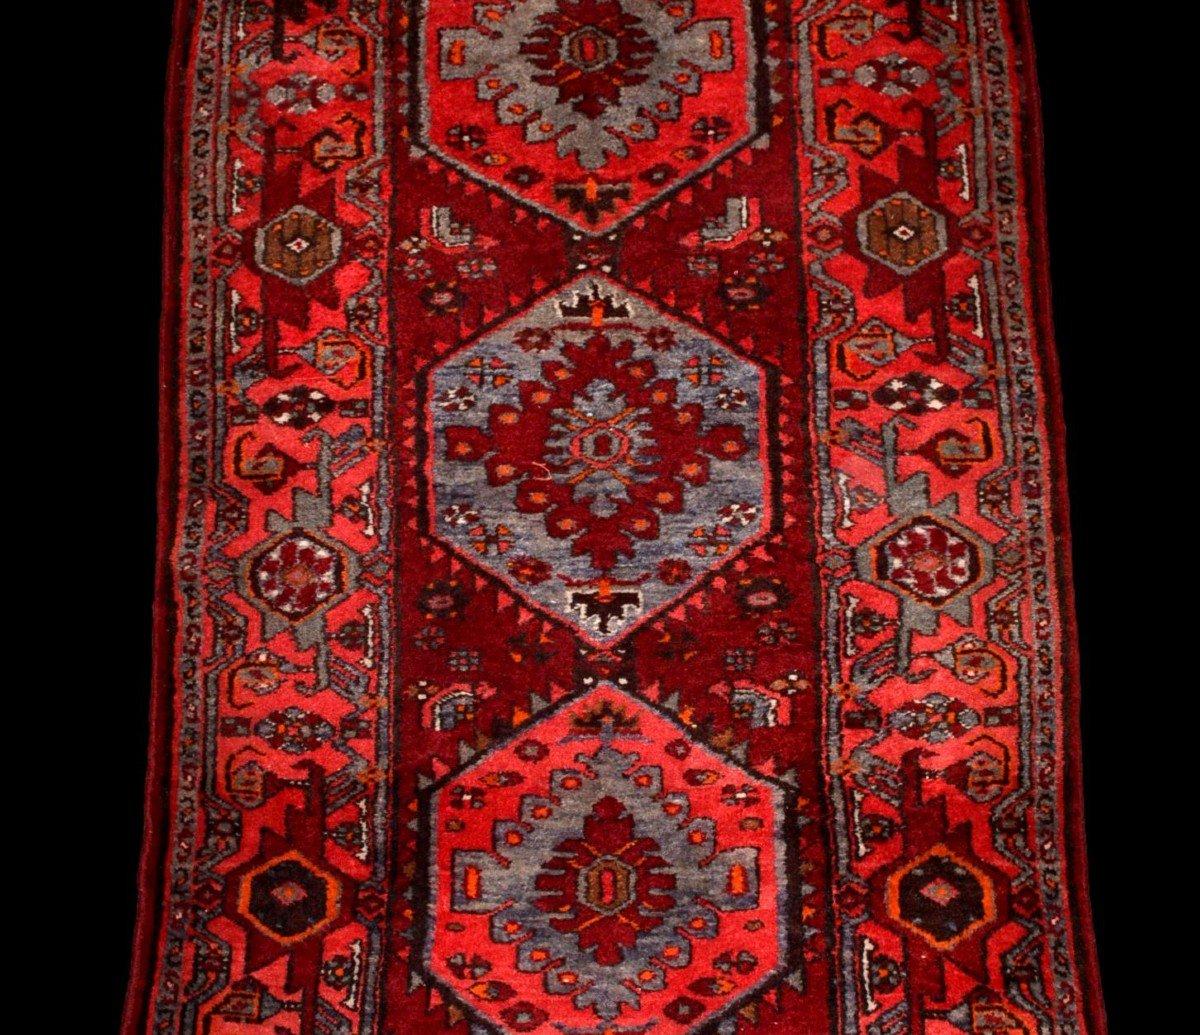 Tapis Persan Hamadan, Iran, 110 cm x 204 cm, laine nouée main vers 1970, parfait état-photo-1